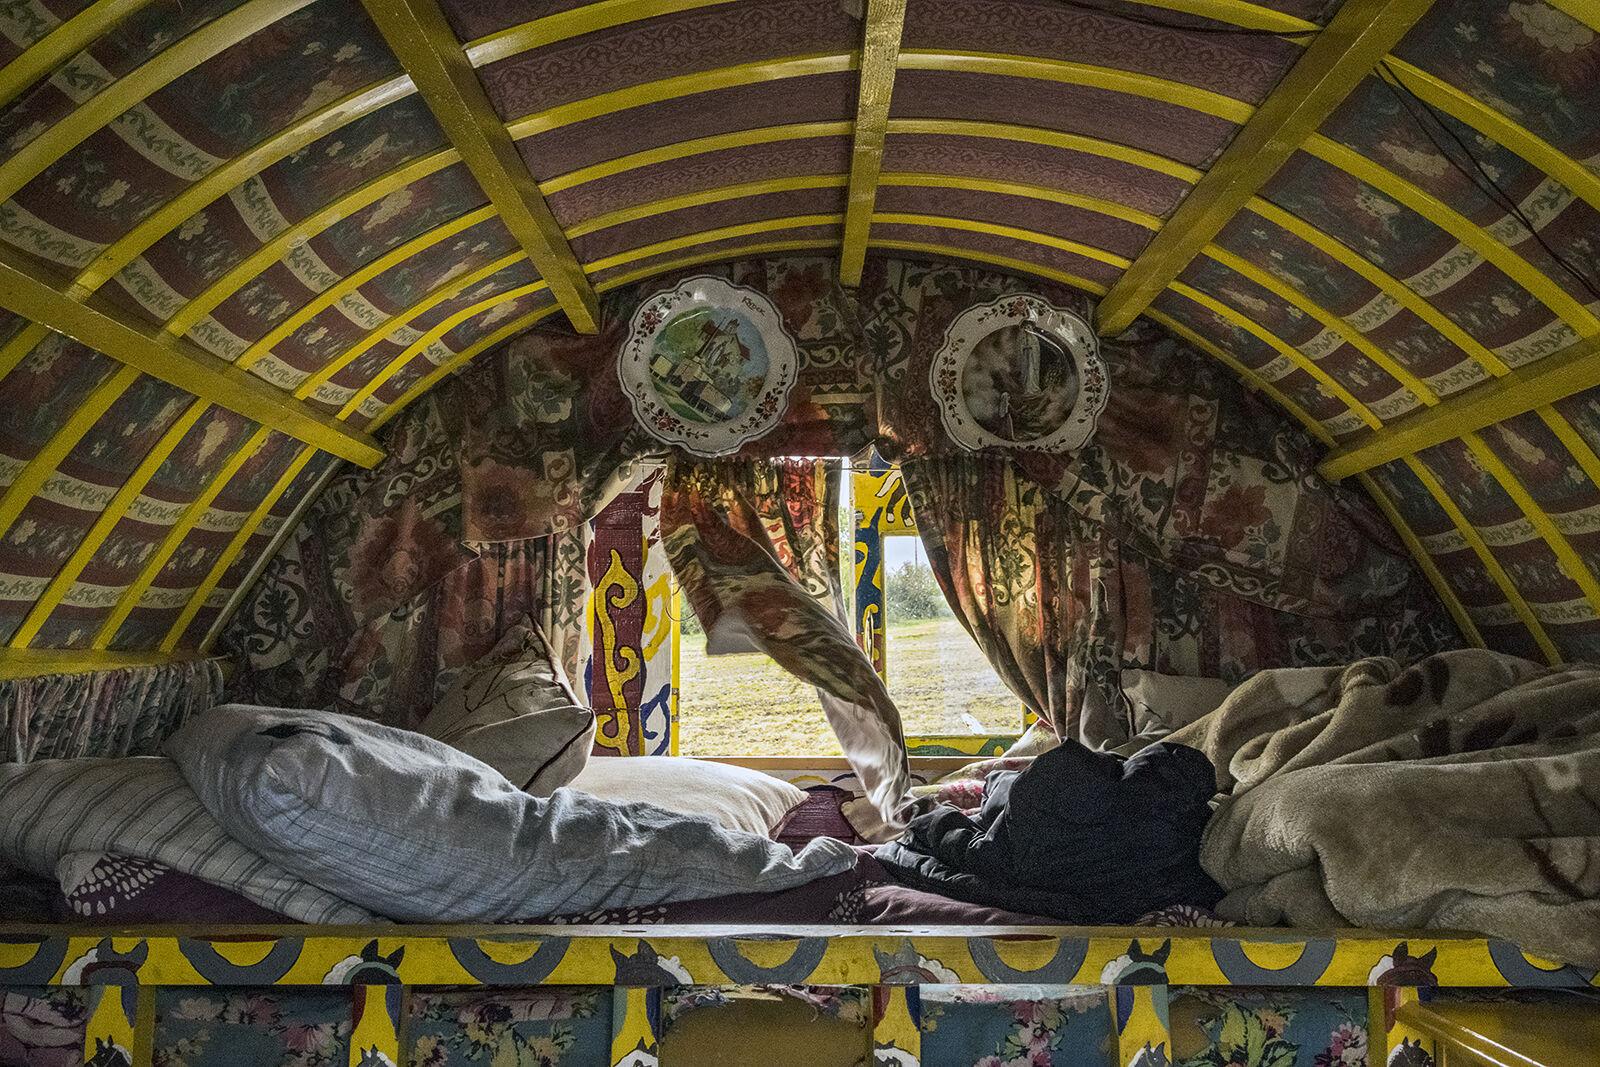 Traditional Caravan Interior, Tipperary, Ireland 2018